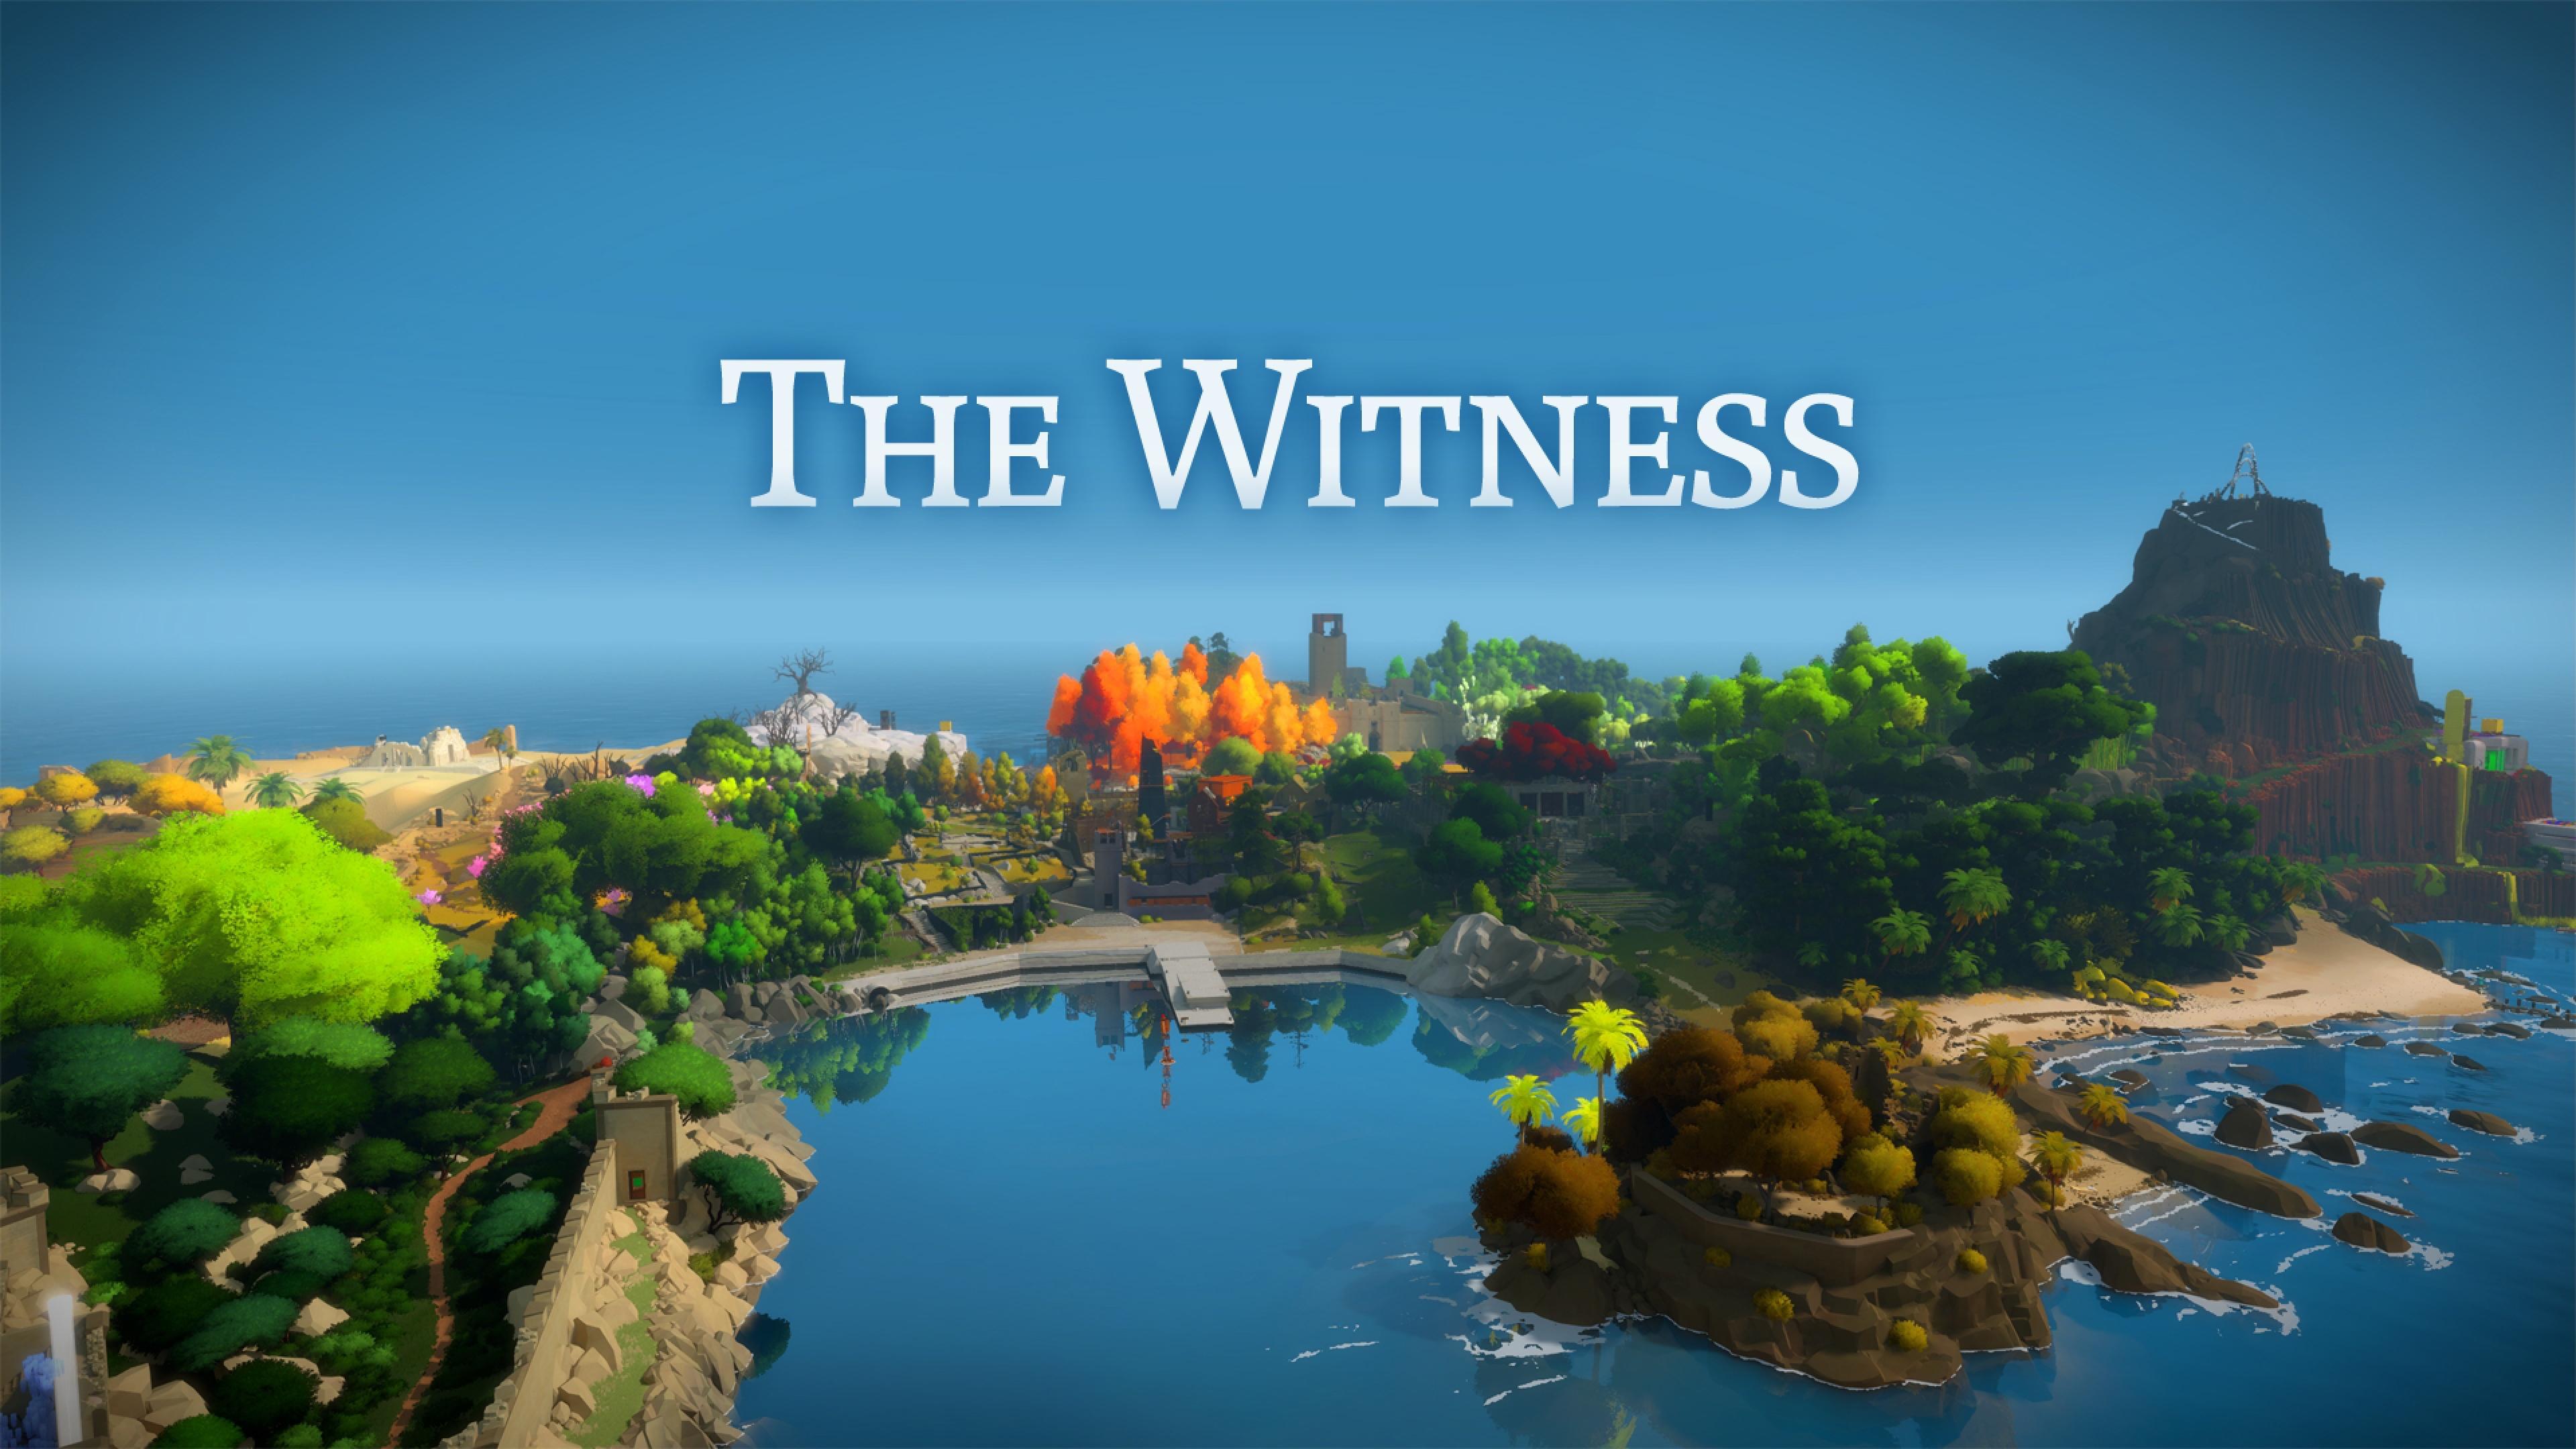 the witness 2016 video game 1535967772 - The Witness 2016 Video Game - the witness wallpapers, ps games wallpapers, pc games wallpapers, games wallpapers, 2016 games wallpapers